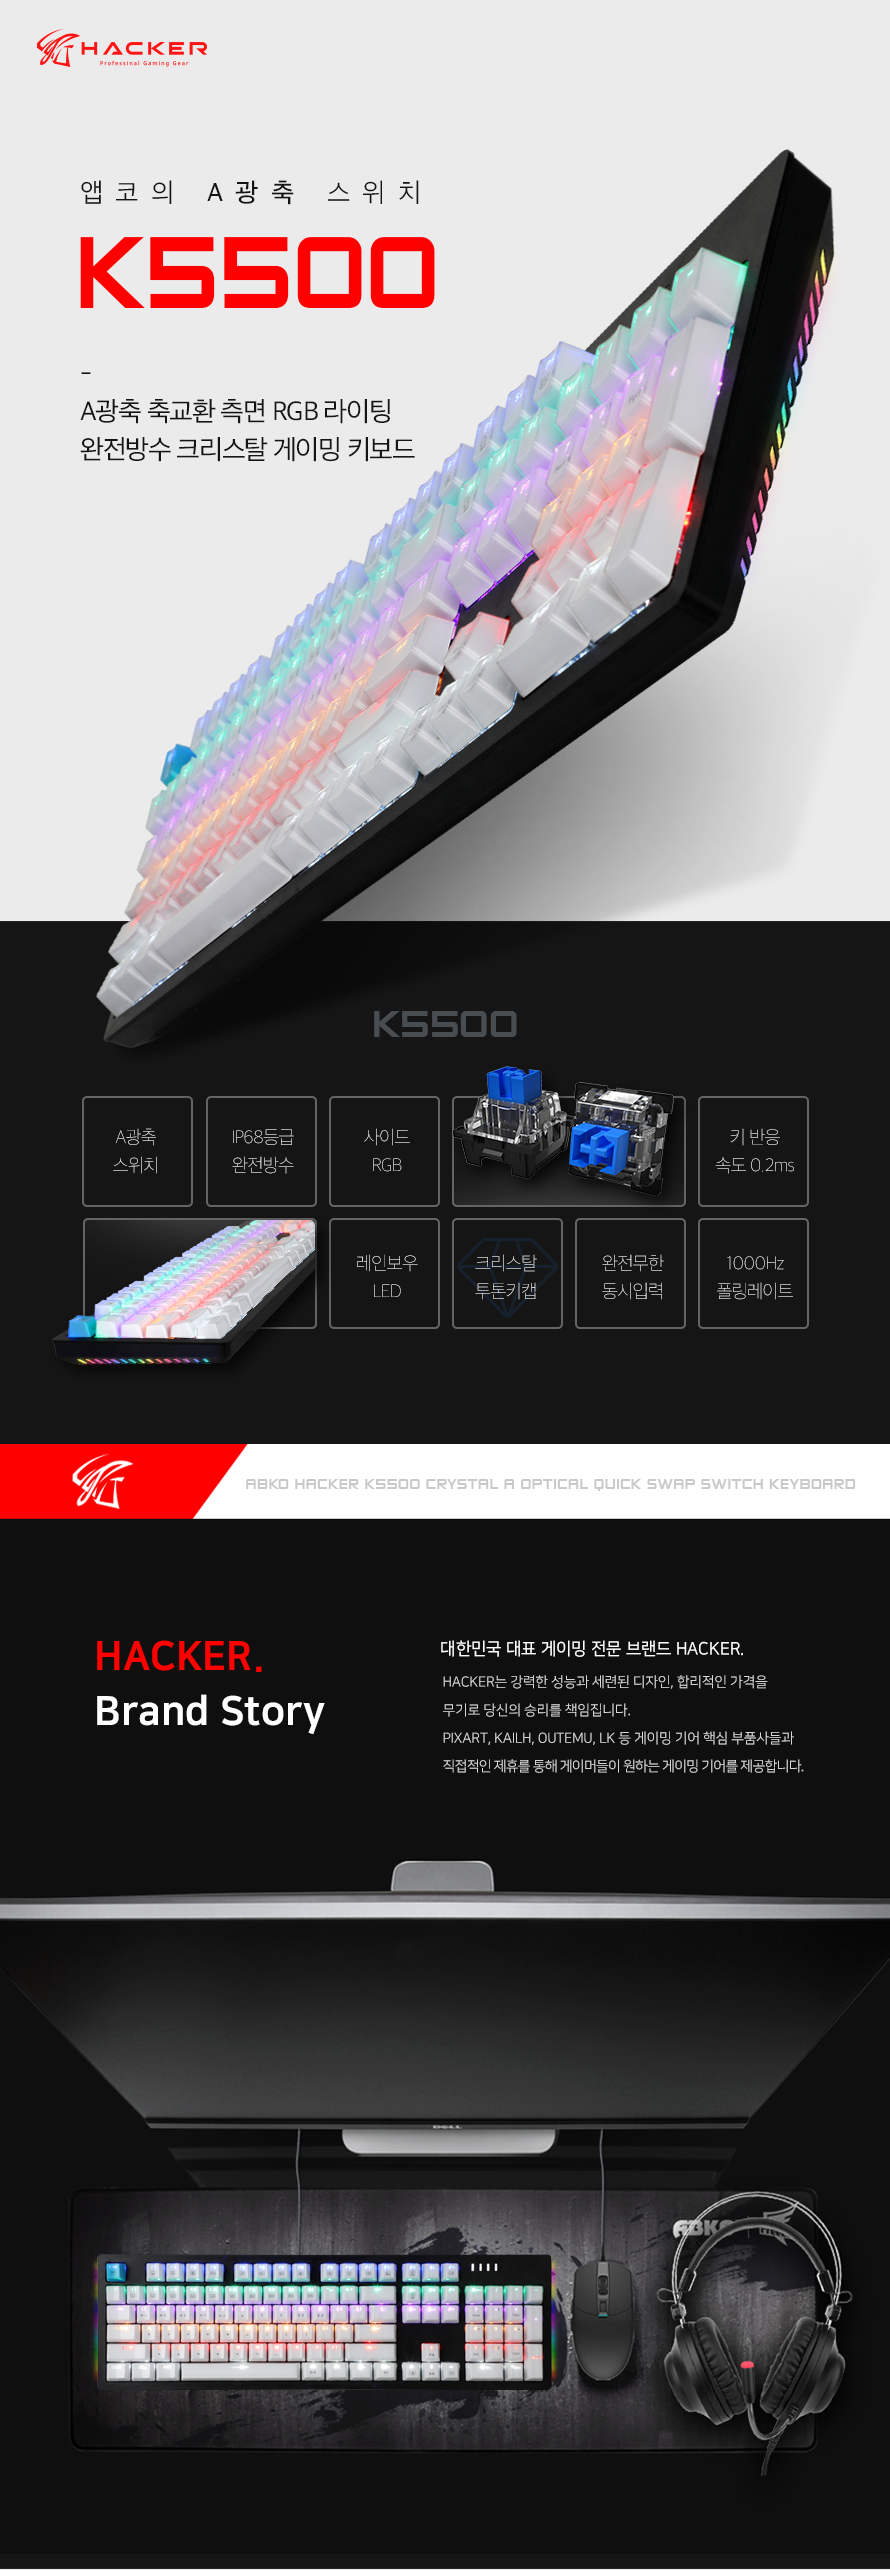 ABKO HACKER K5500 A광축 축교환 측면 RGB 라이팅 완전방수 크리스탈 게이밍 키보드 (블랙, 클릭)